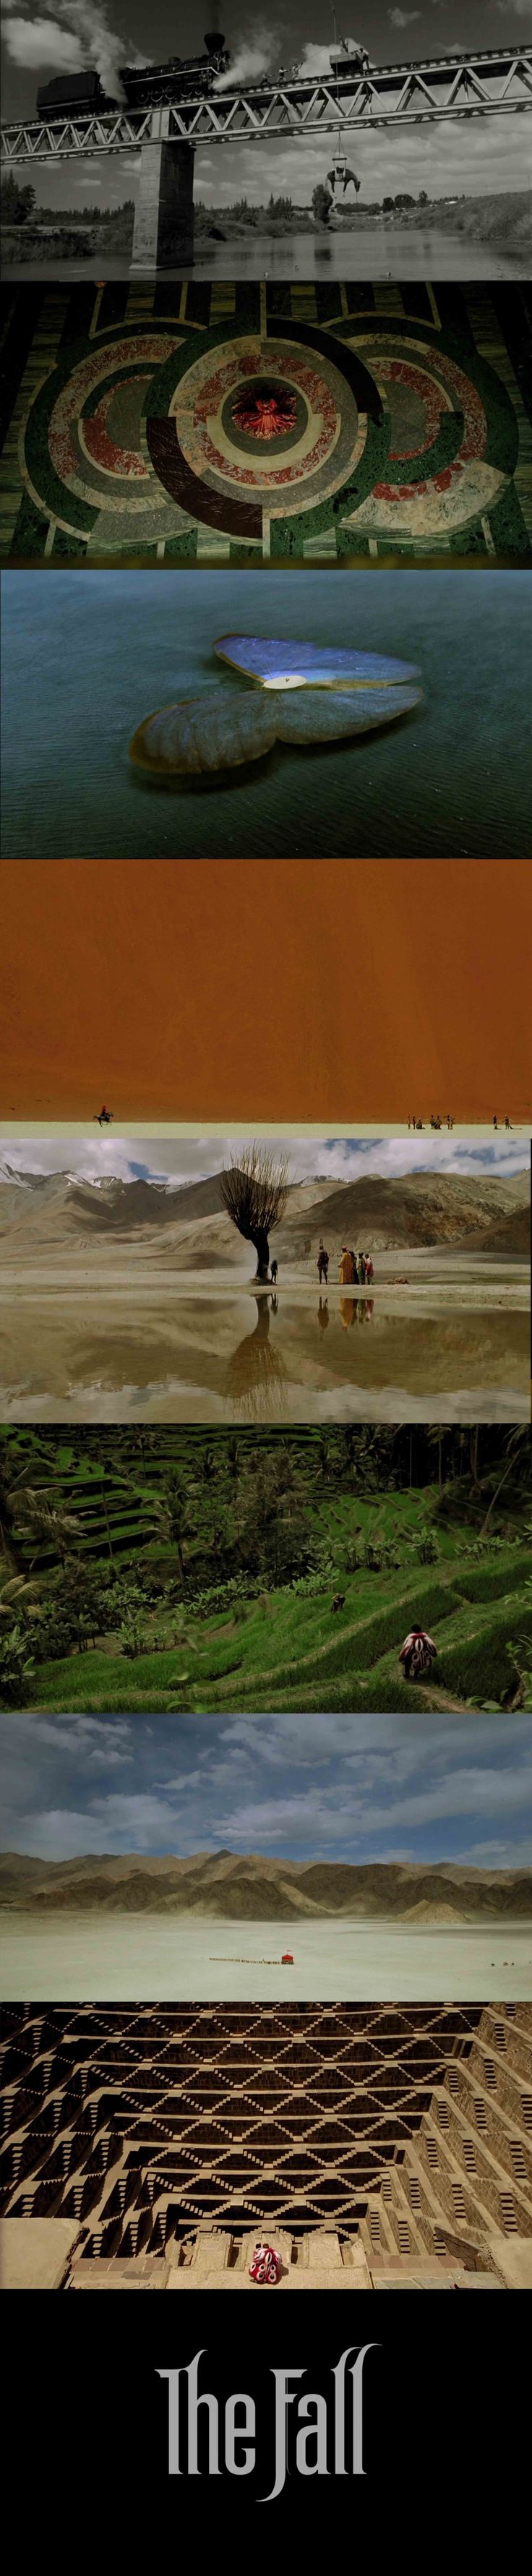 The Fall (Tarsem Singh, 2006) DoP:Colin Watkinson